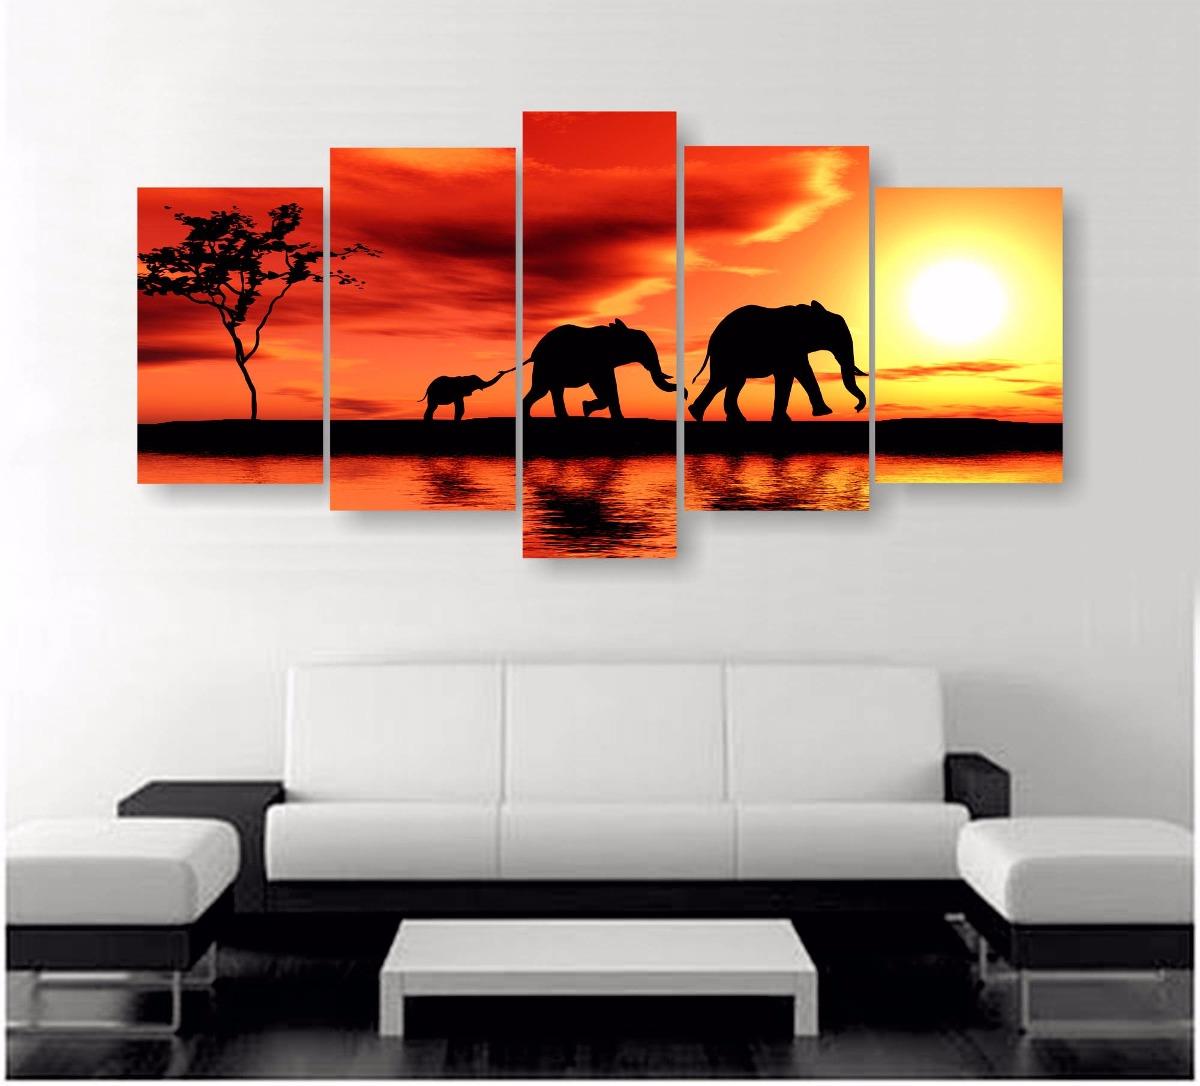 Cuadros decorativos moderno de 5 secciones de 115x50 cms for Imagenes cuadros modernos